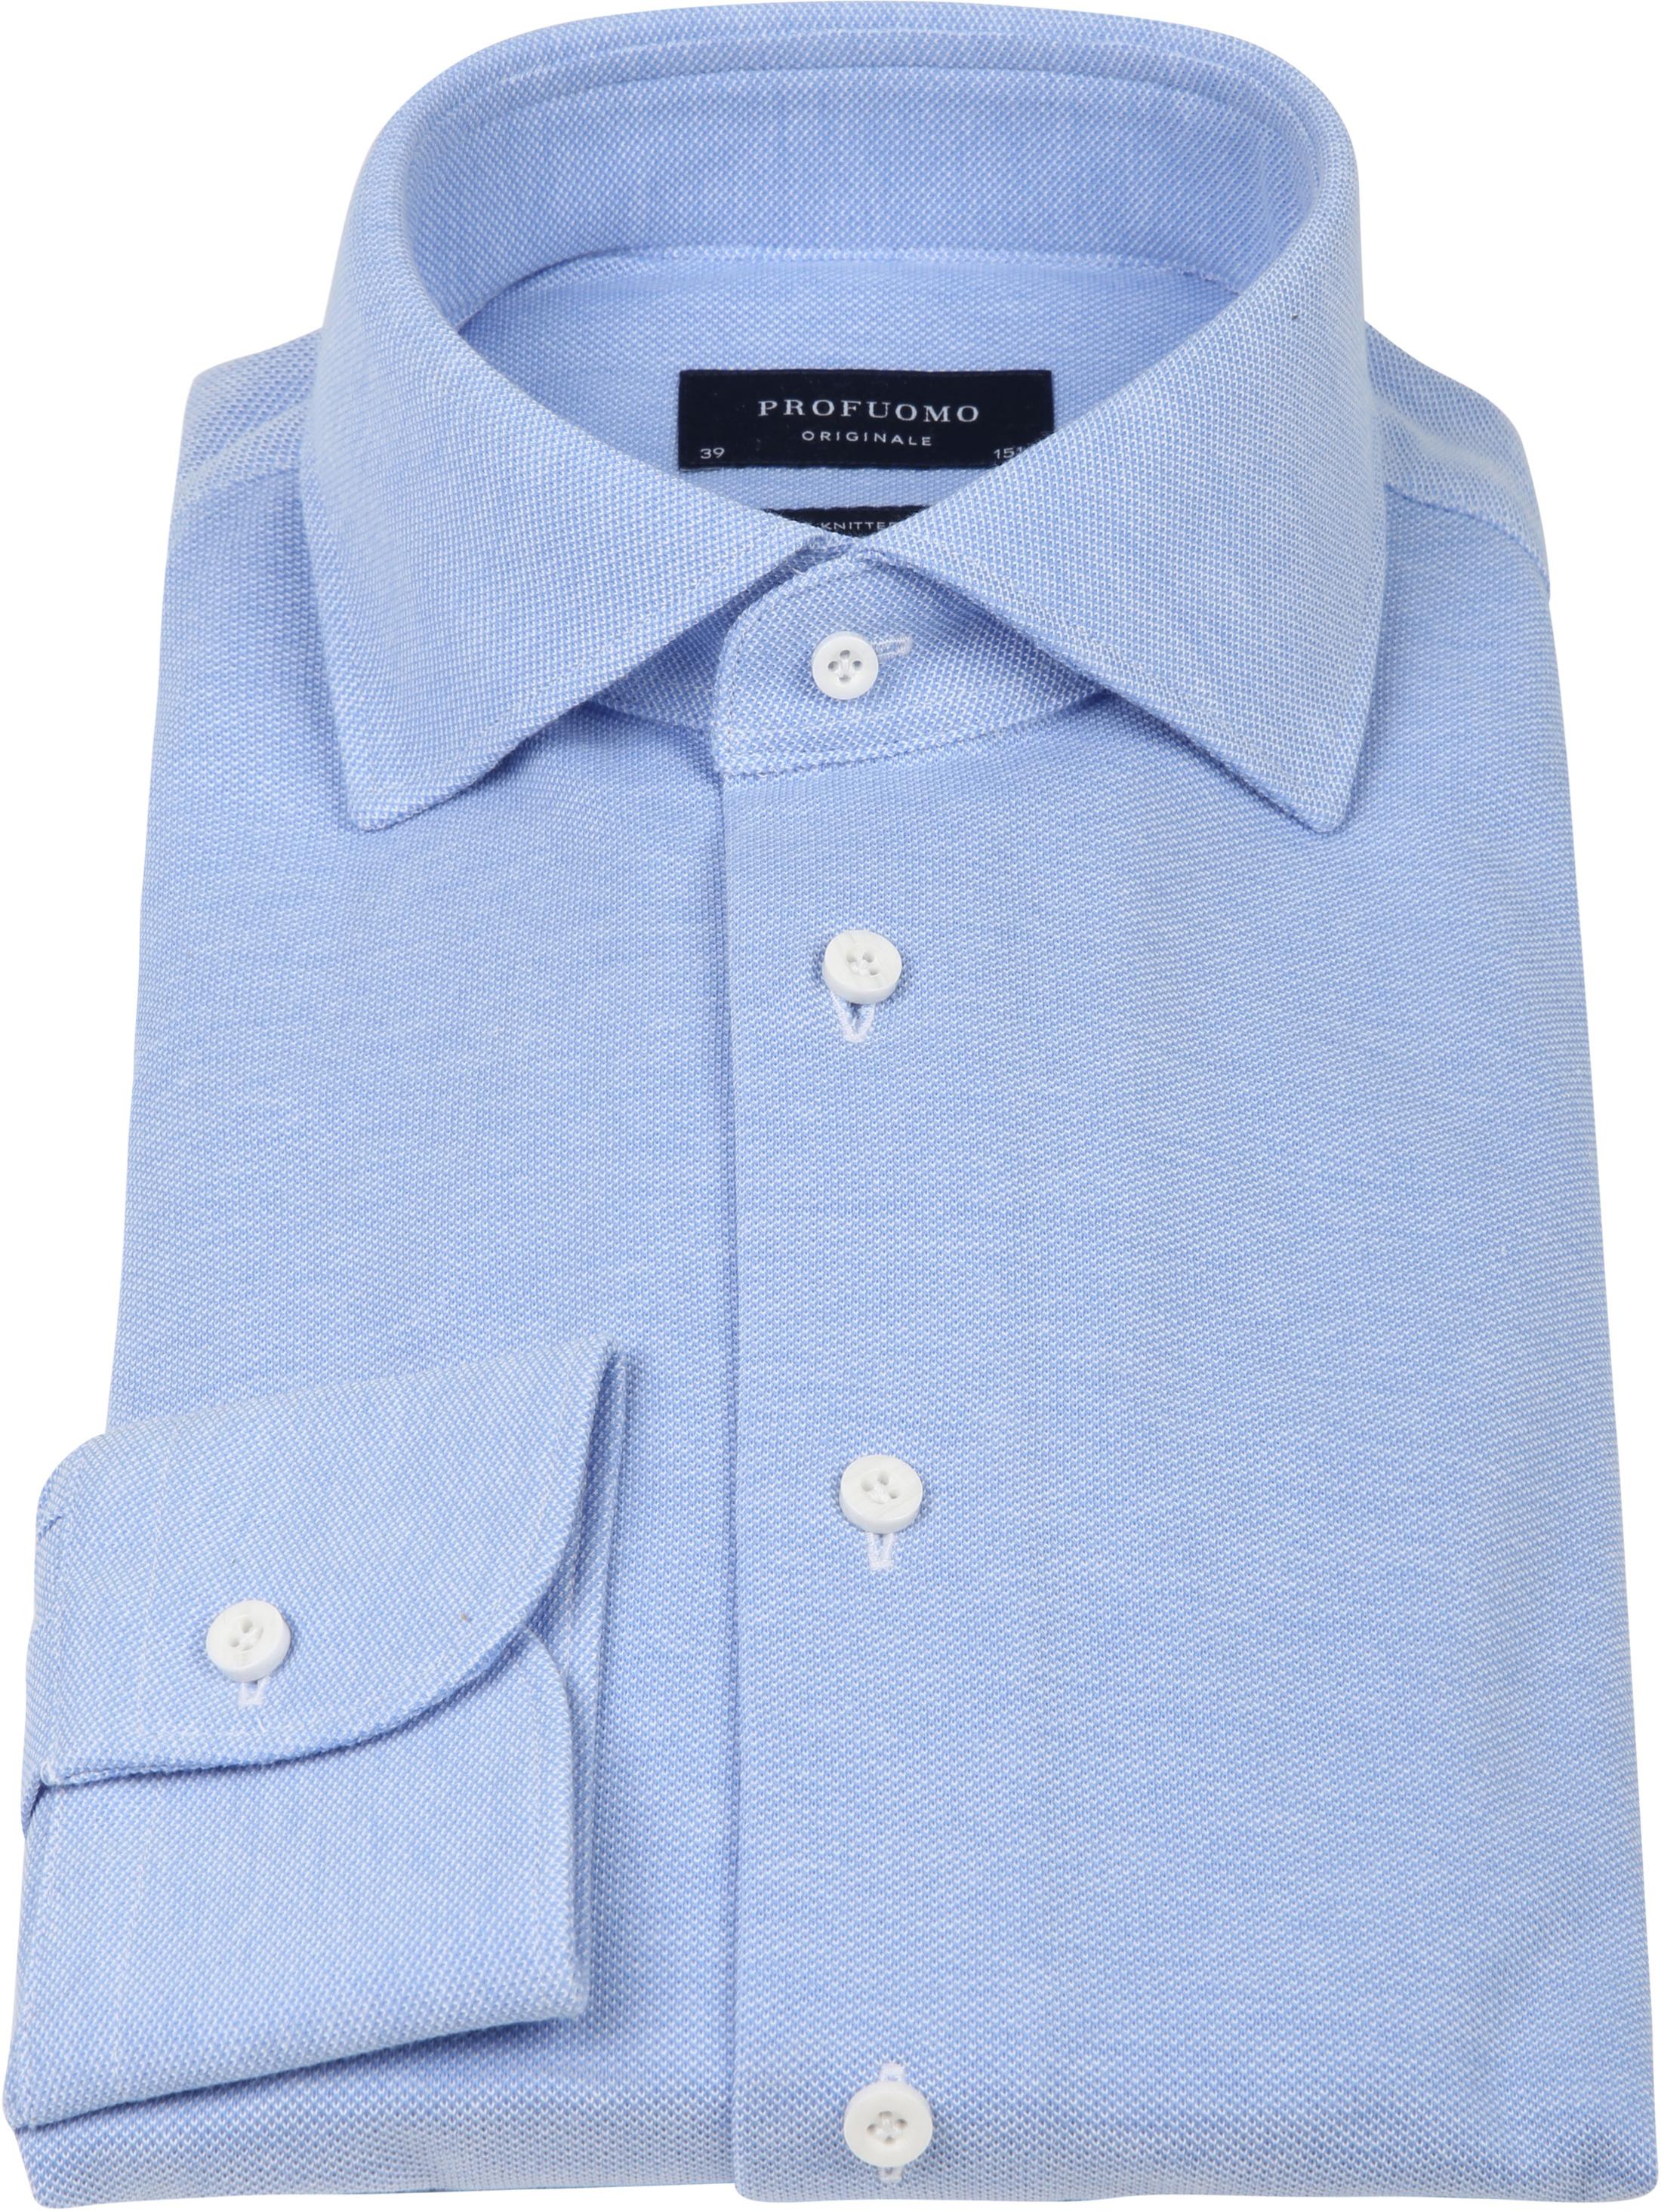 Profuomo Hemd Knitted Slim Fit Blau Foto 2